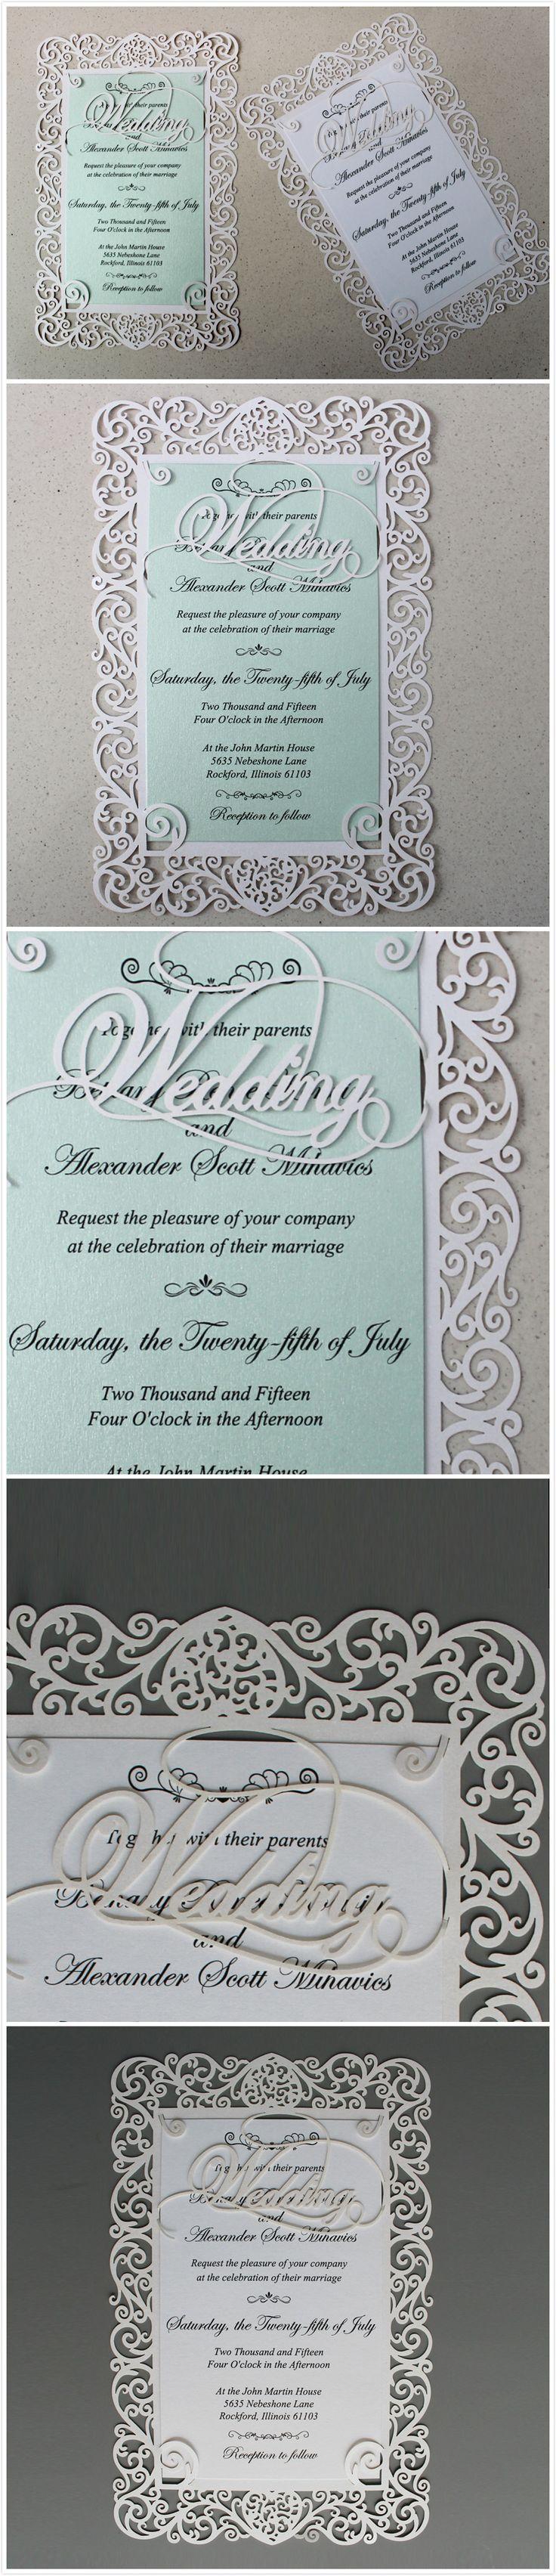 Wedding Invitations Lace Wedding Invitation Laser Cut